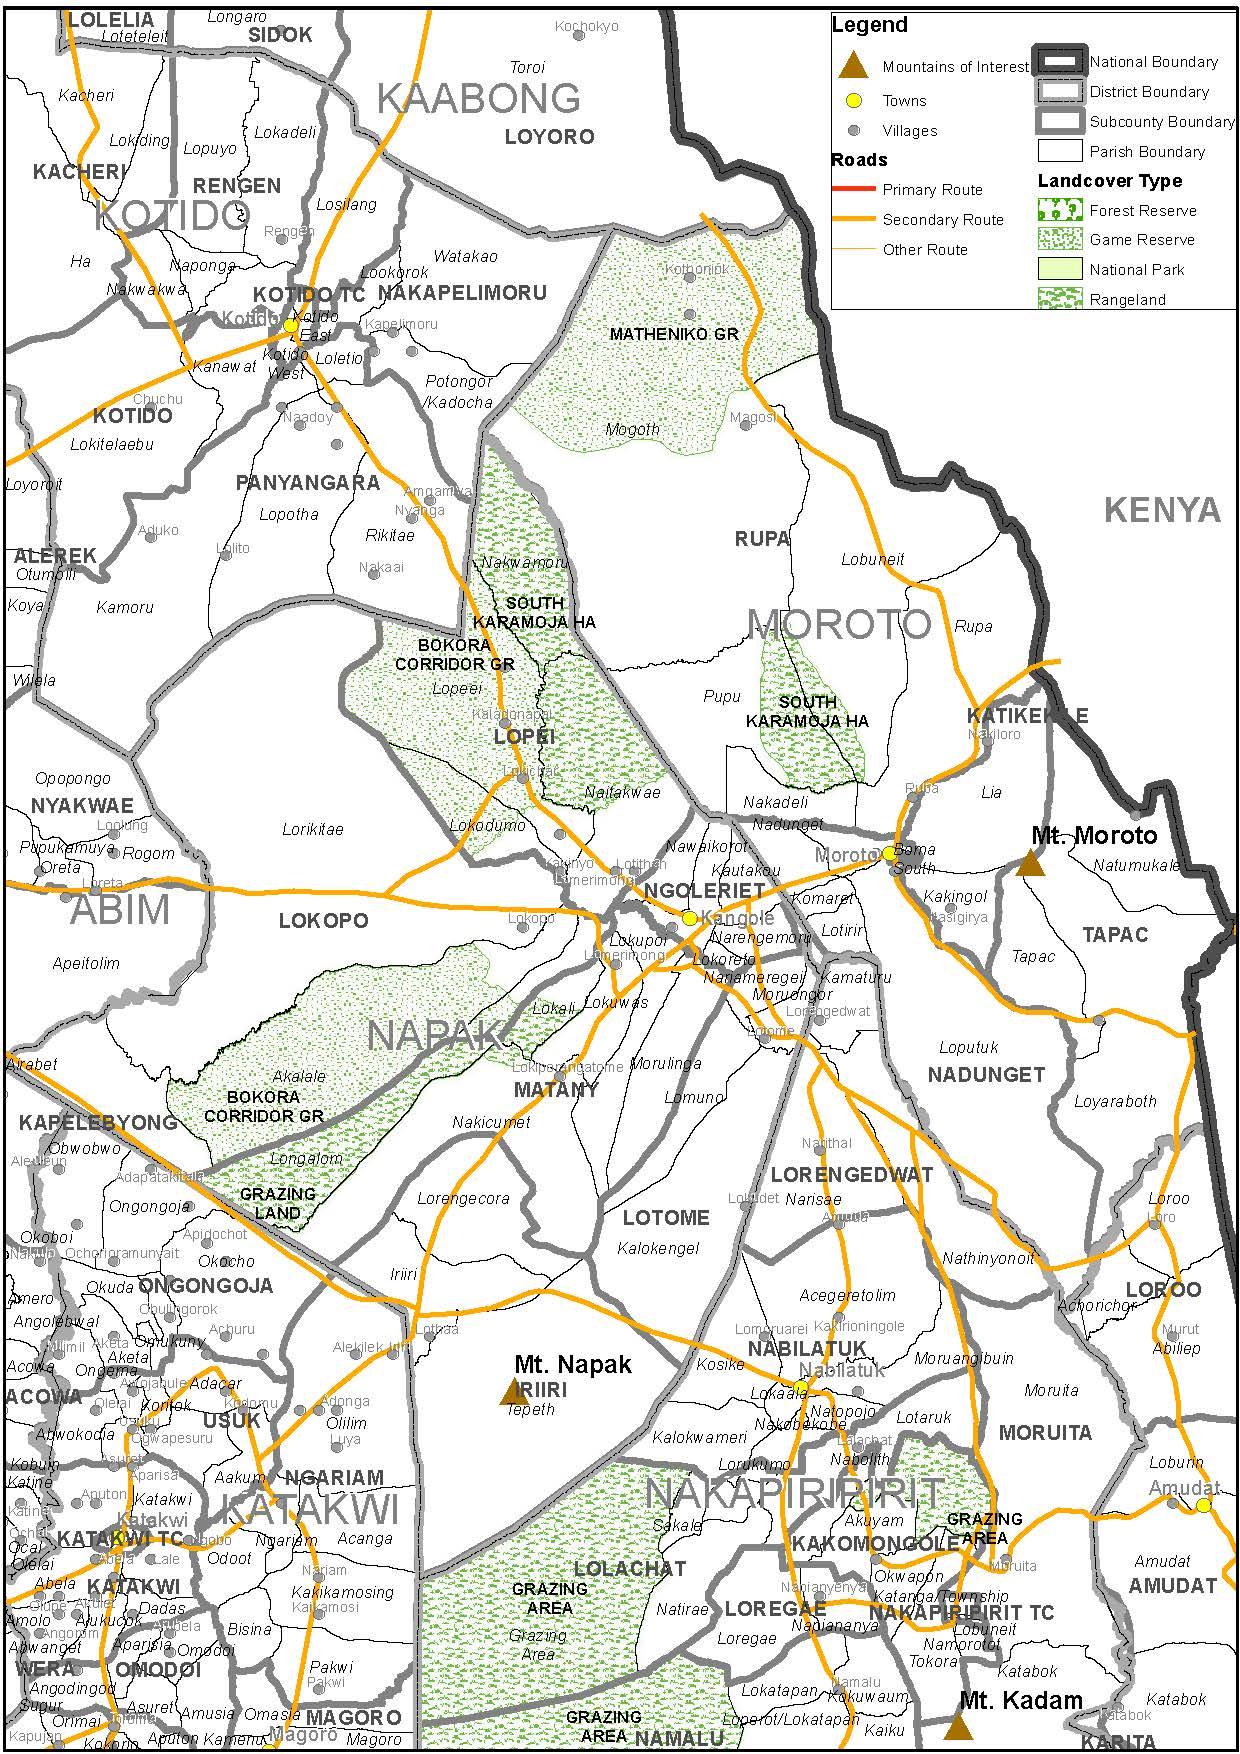 Map showing Moroto and Napak in Karamoja region